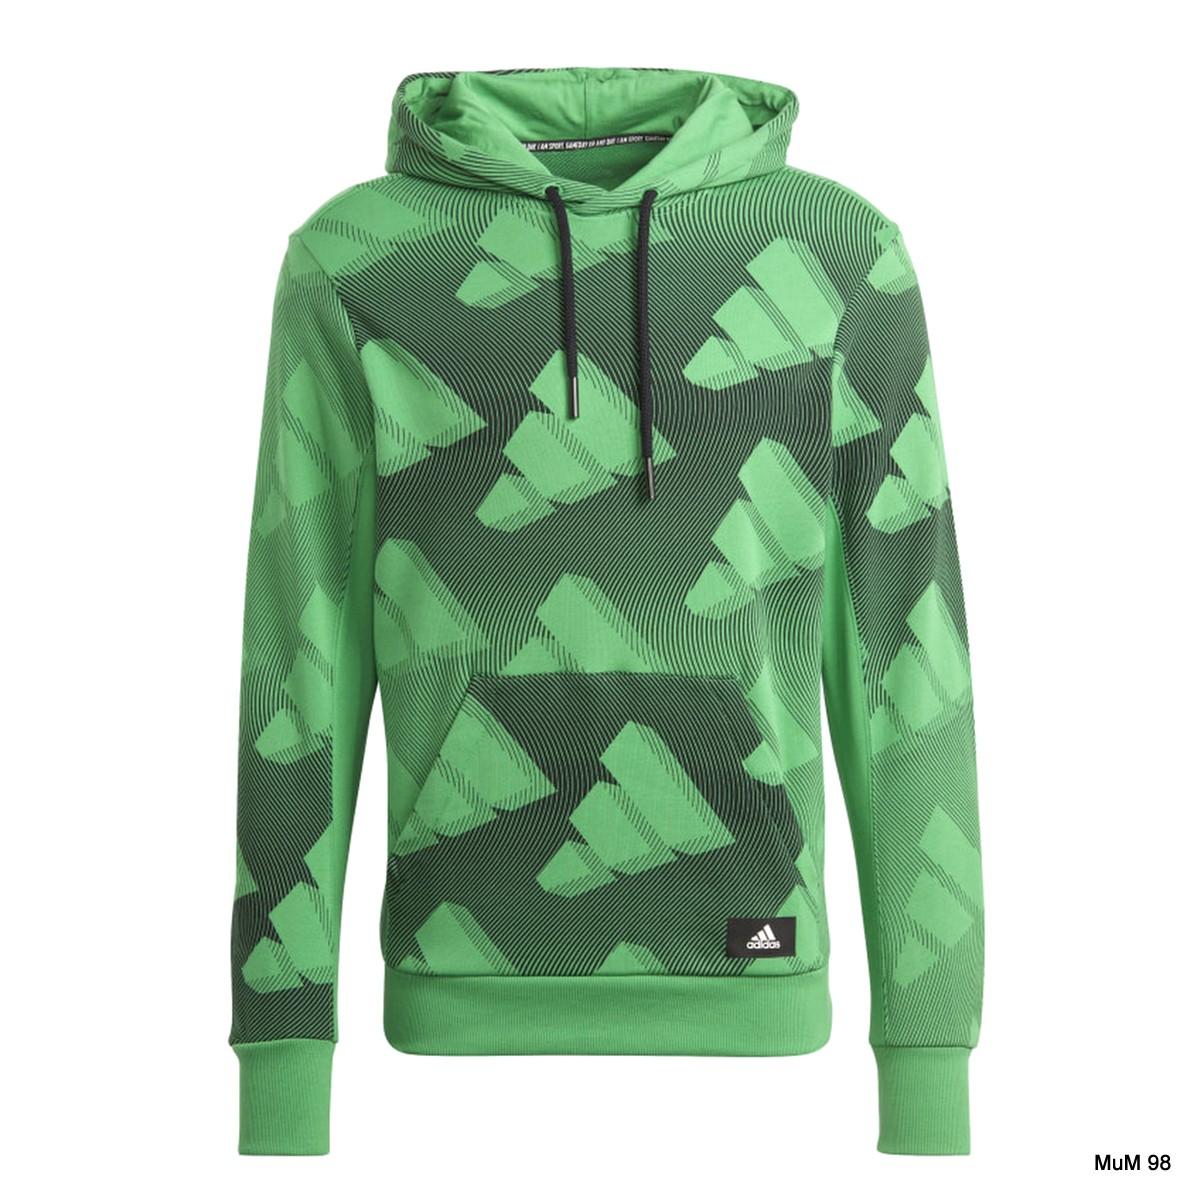 Adidas M FI GFX PO